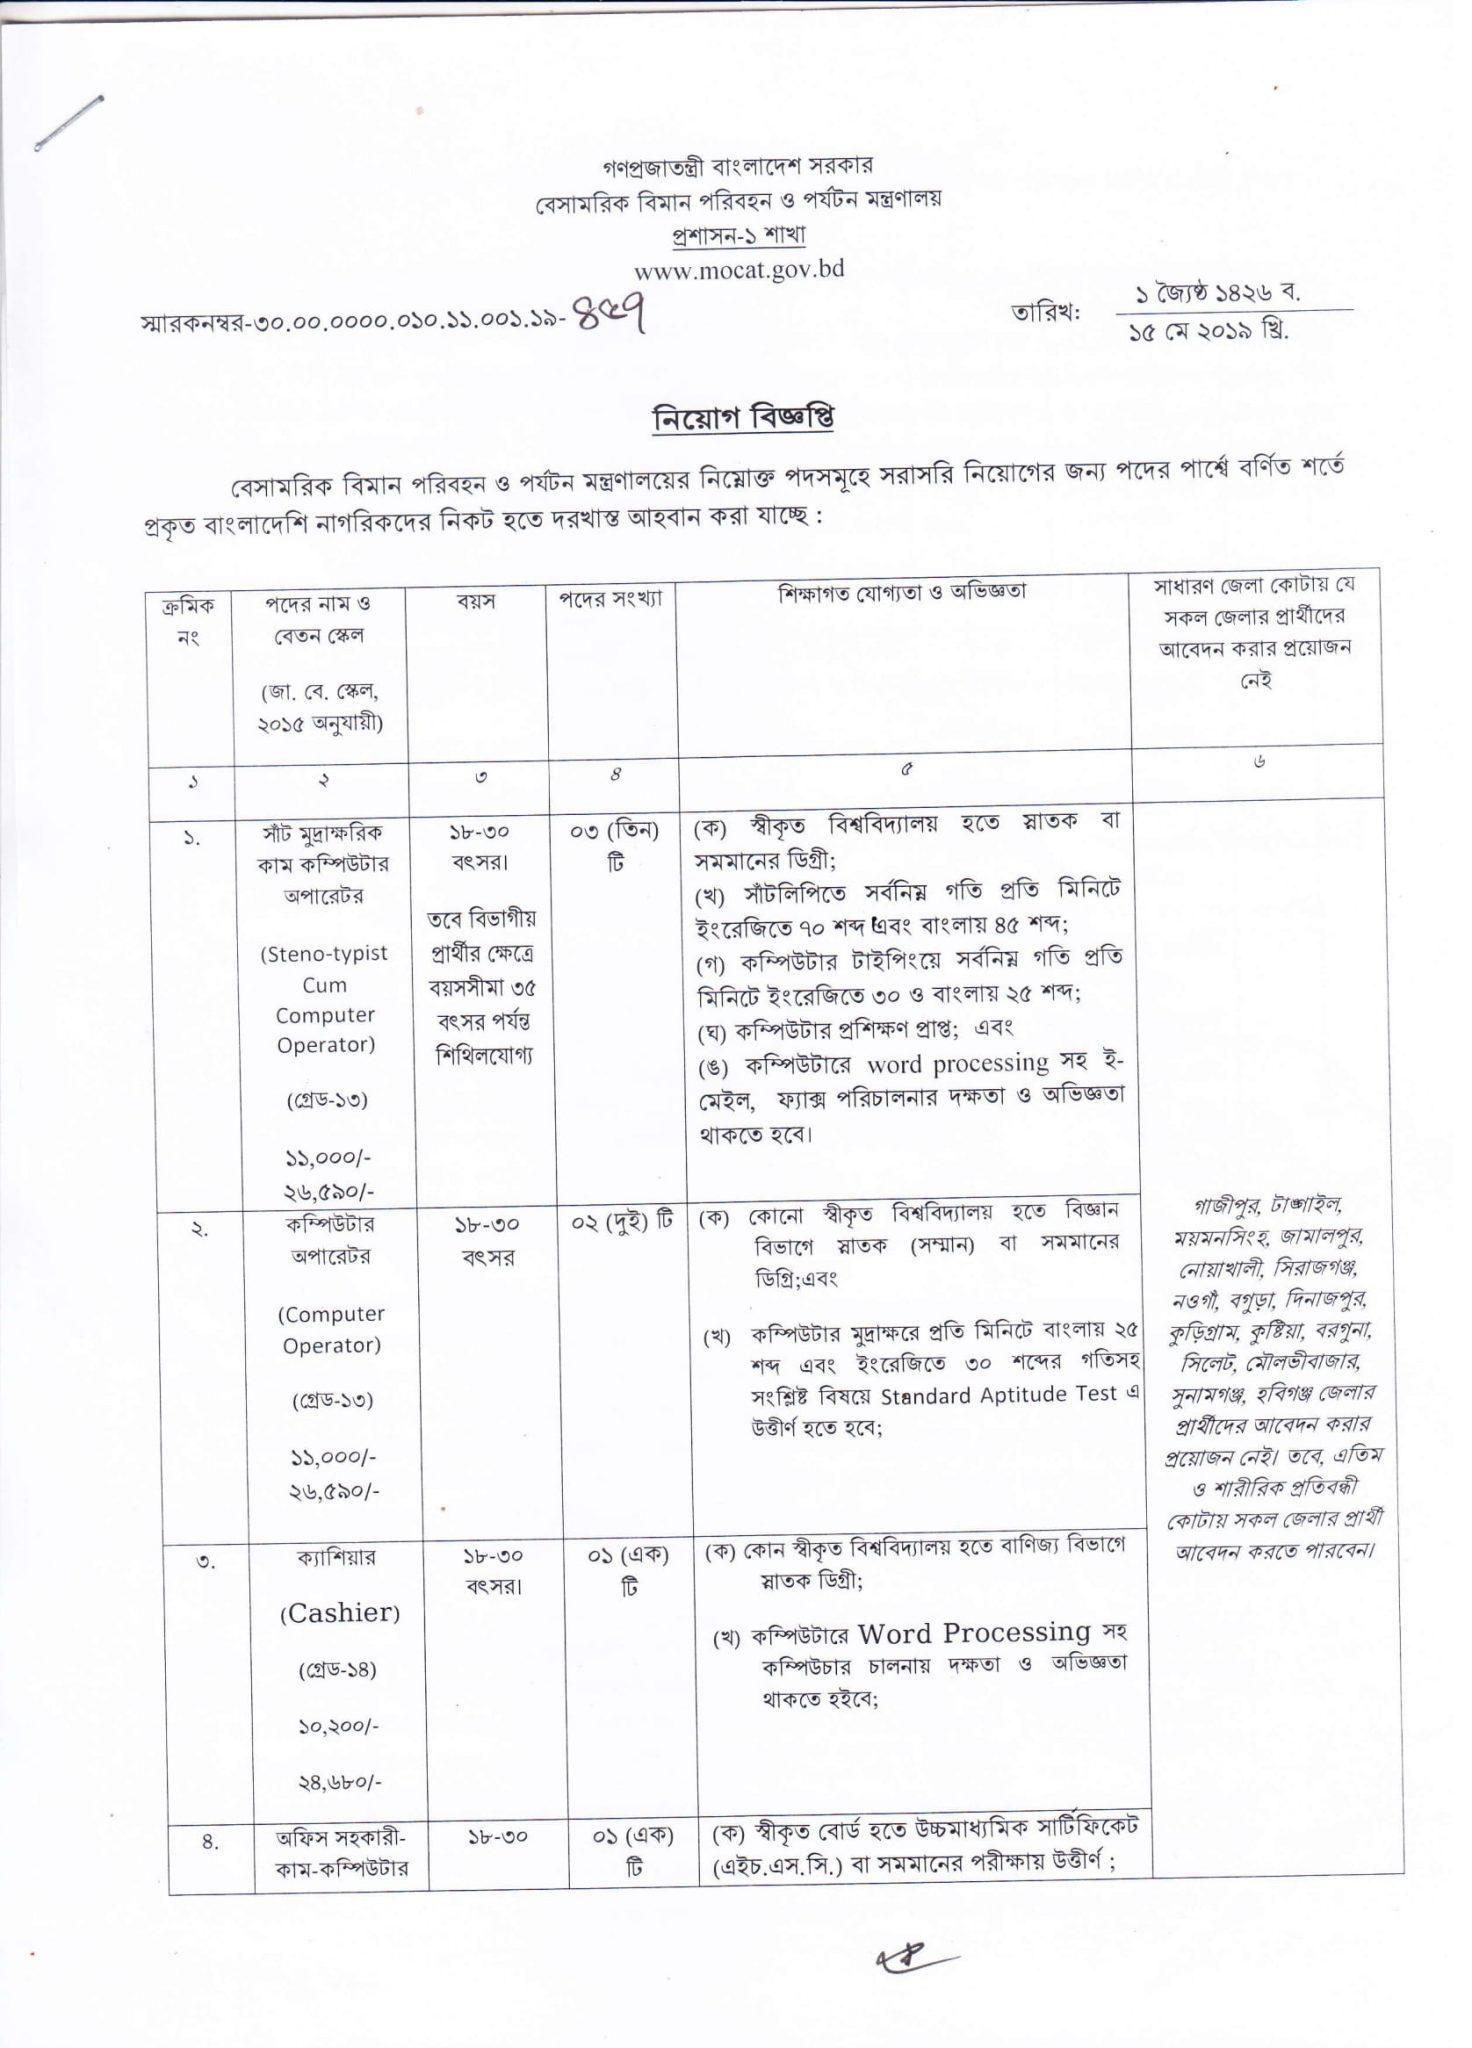 Ministry of Civil Aviation and Tourism mocat Job Circular 2019